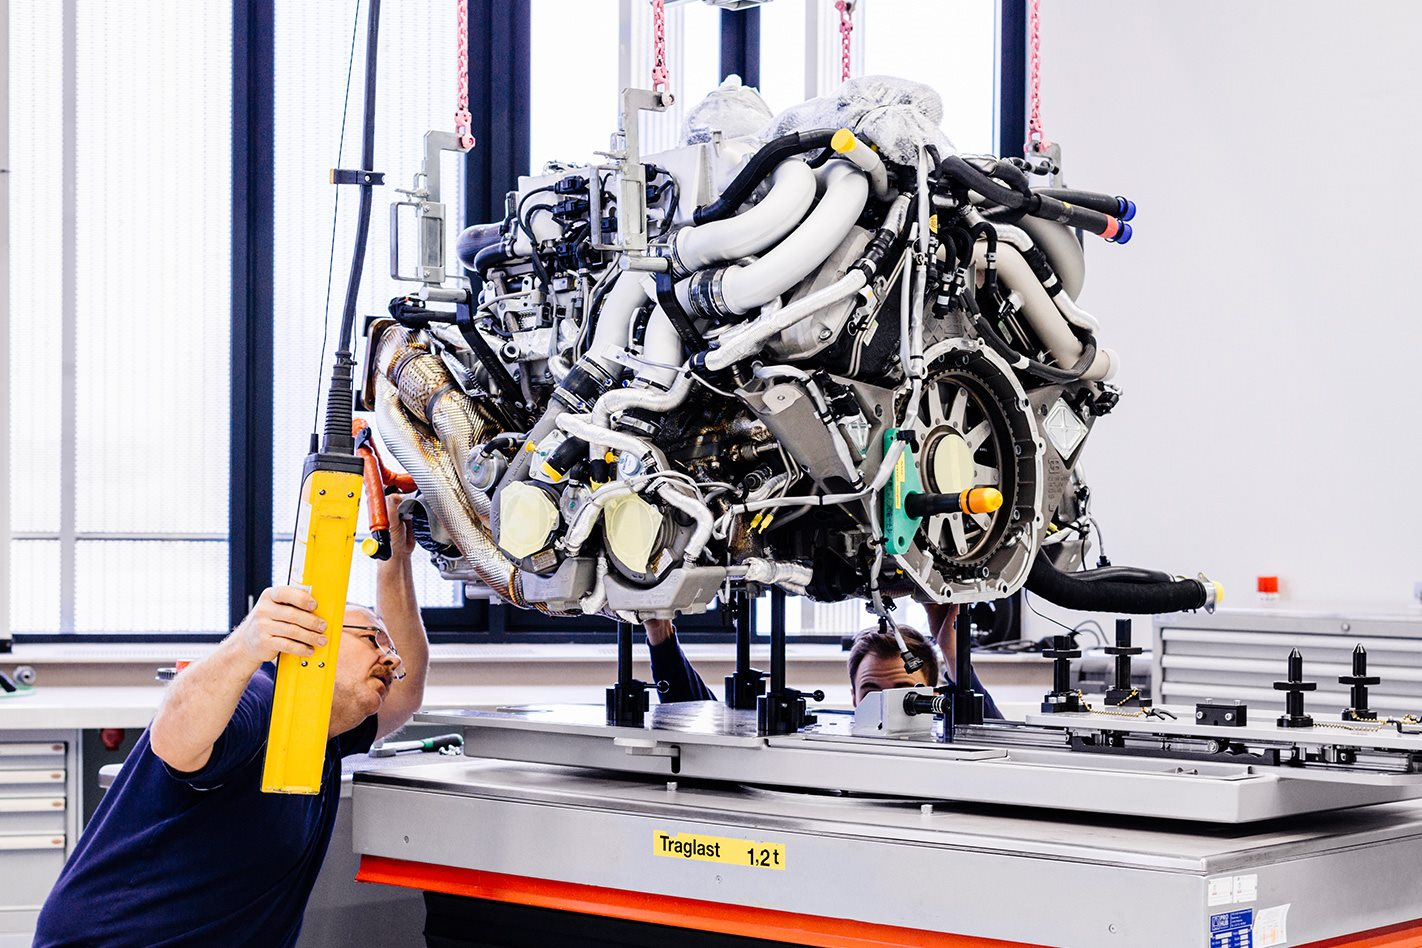 Bugatti factory engine